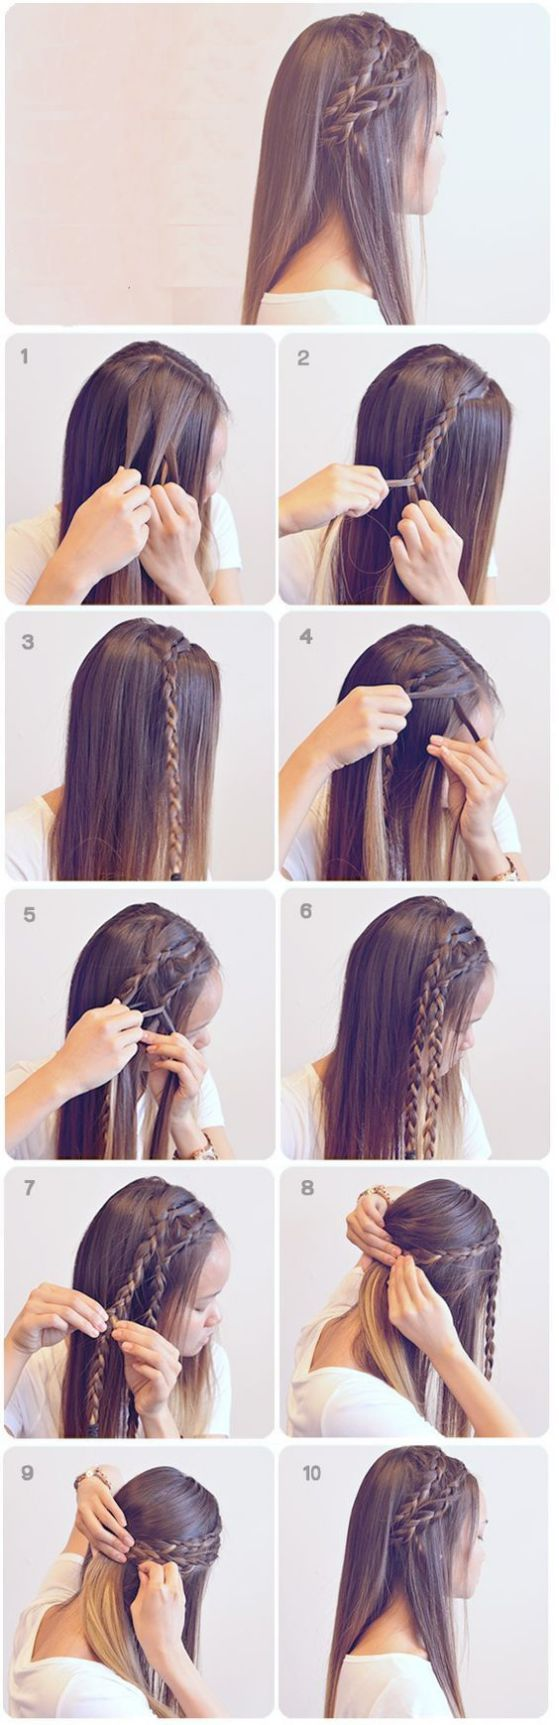 Peinados con Trenzas fáciles tutoriales paso a paso Hair style